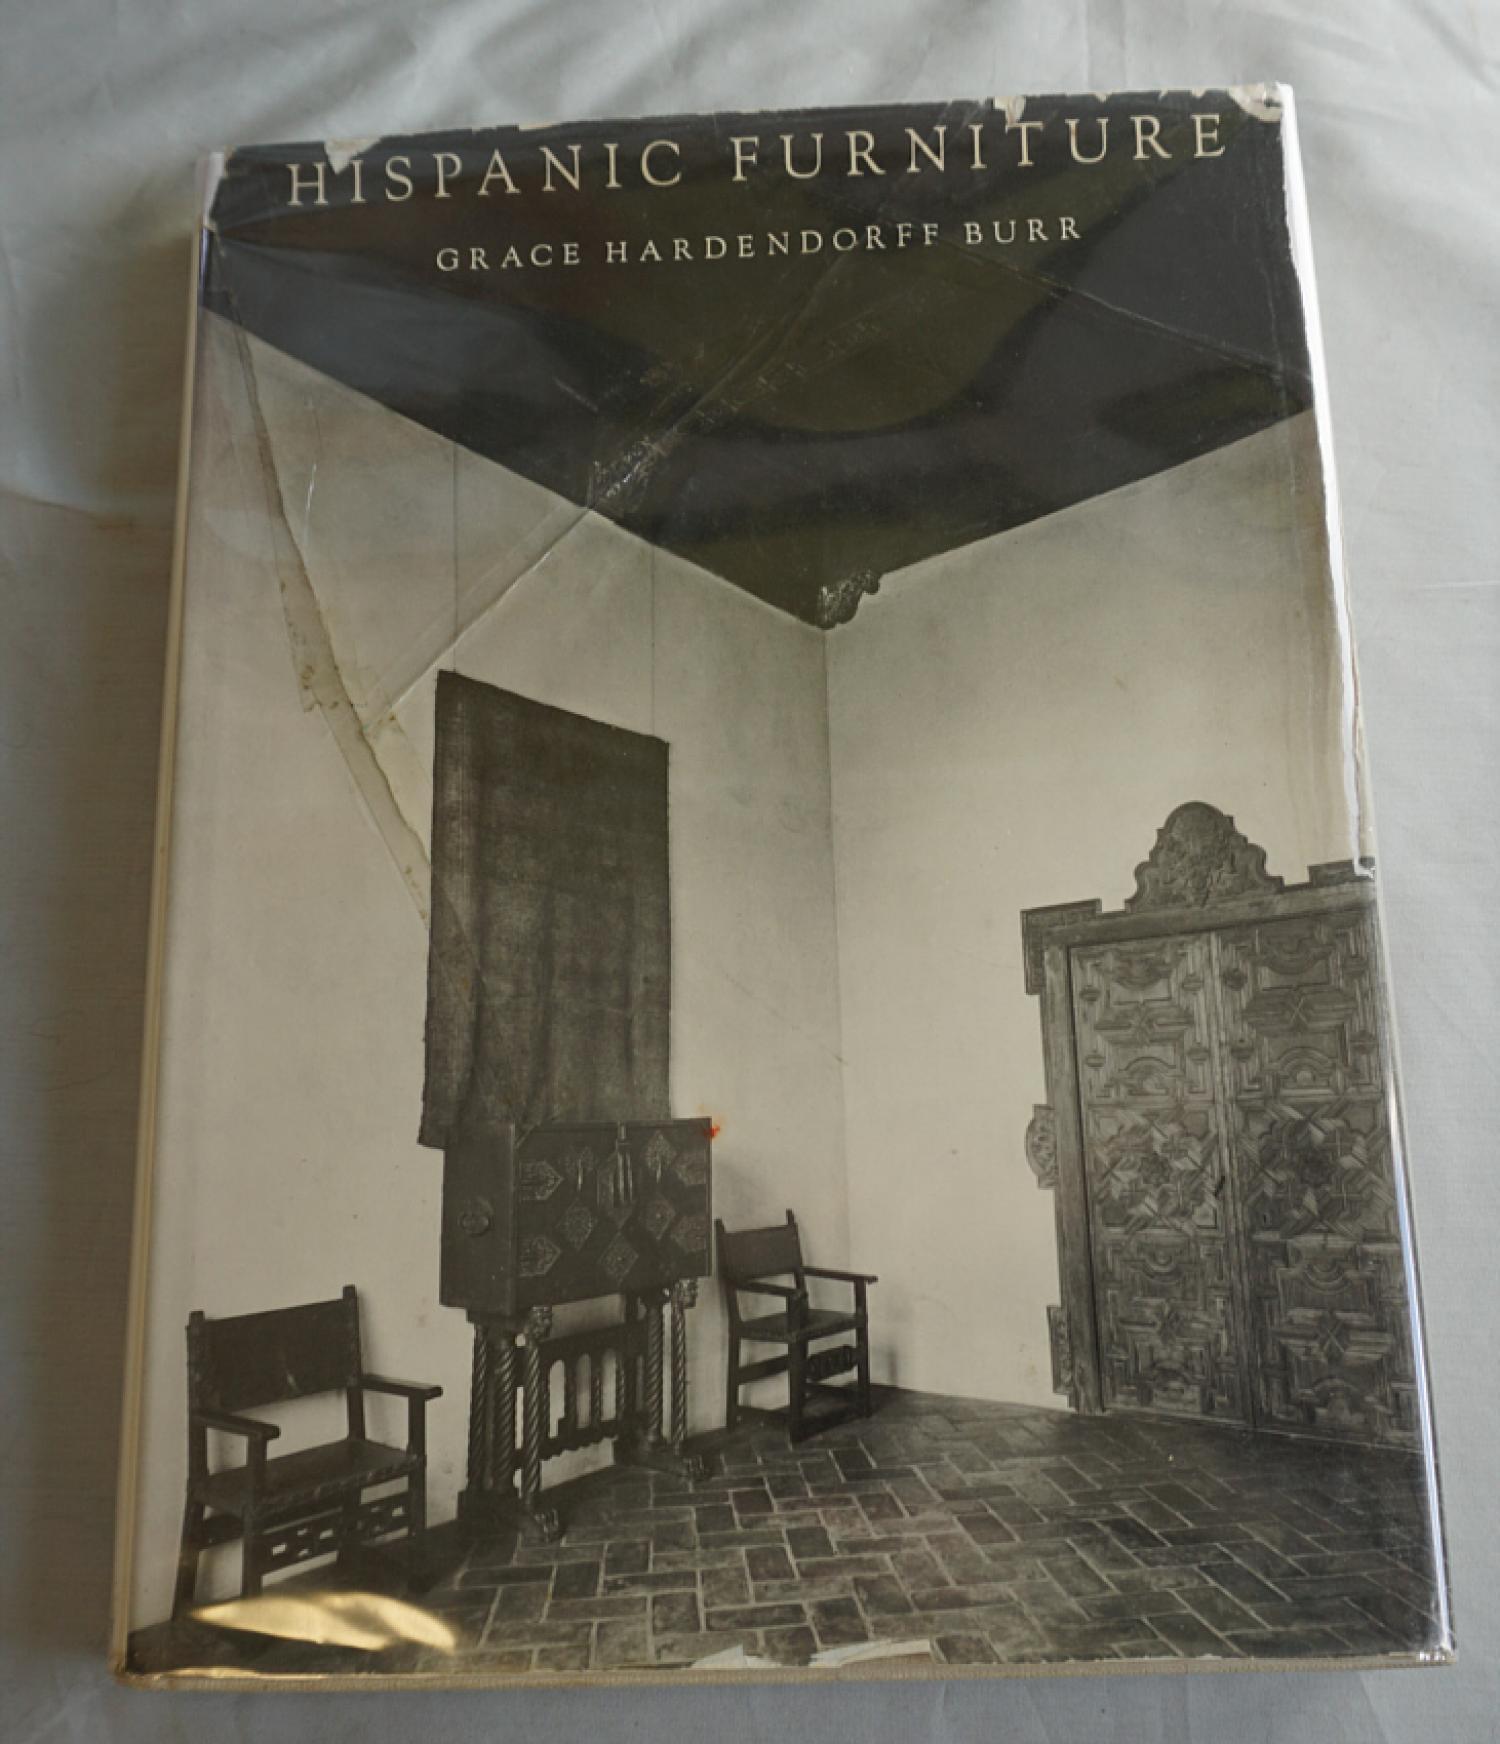 Hispanic Furniture by Grace Hardendorff Burr 1964